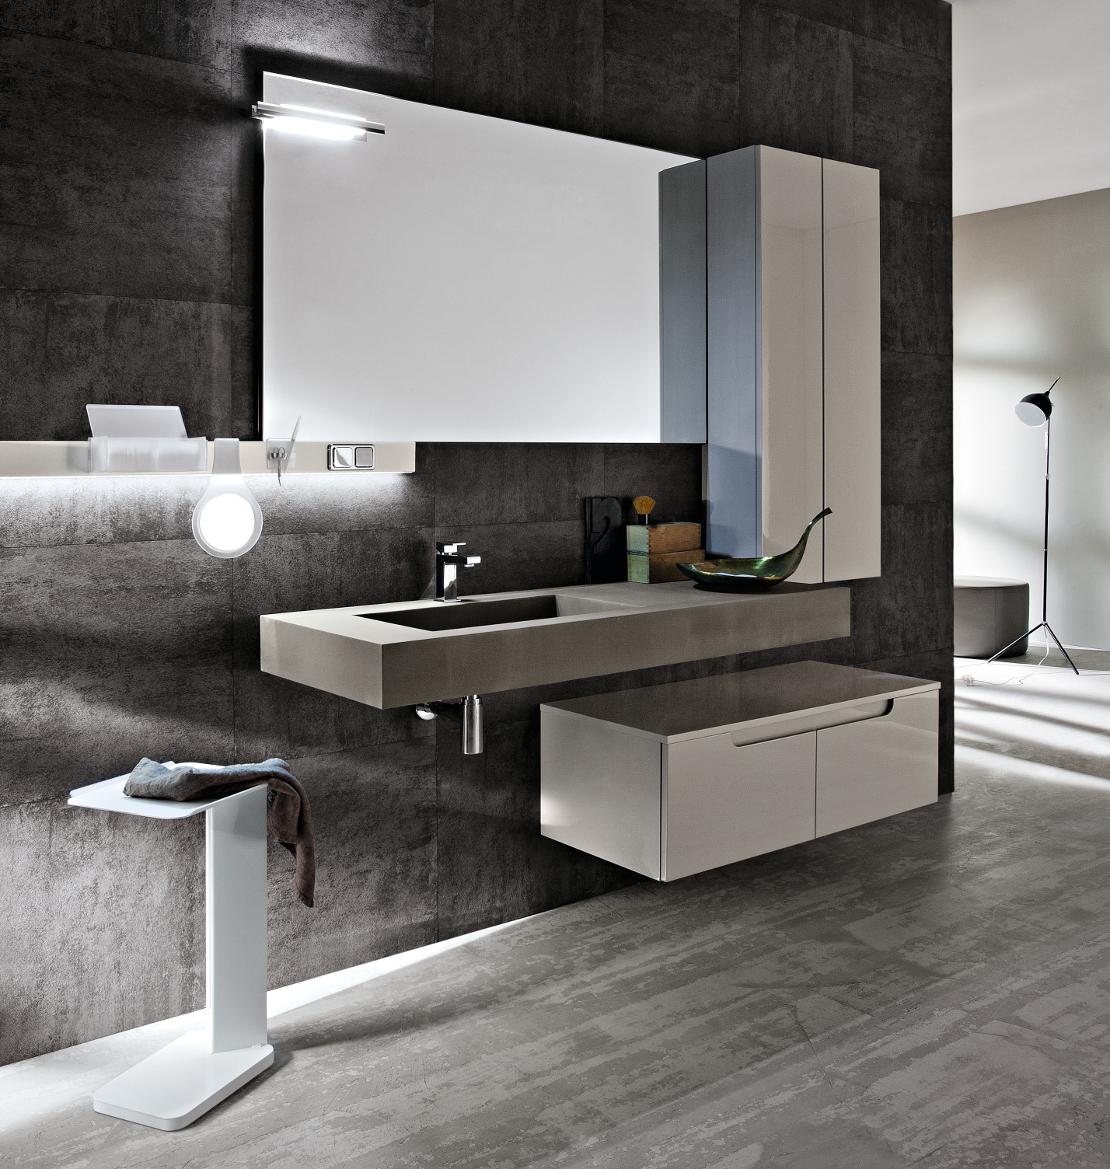 Mobili arredo bagno e lavanderia for Design moderno